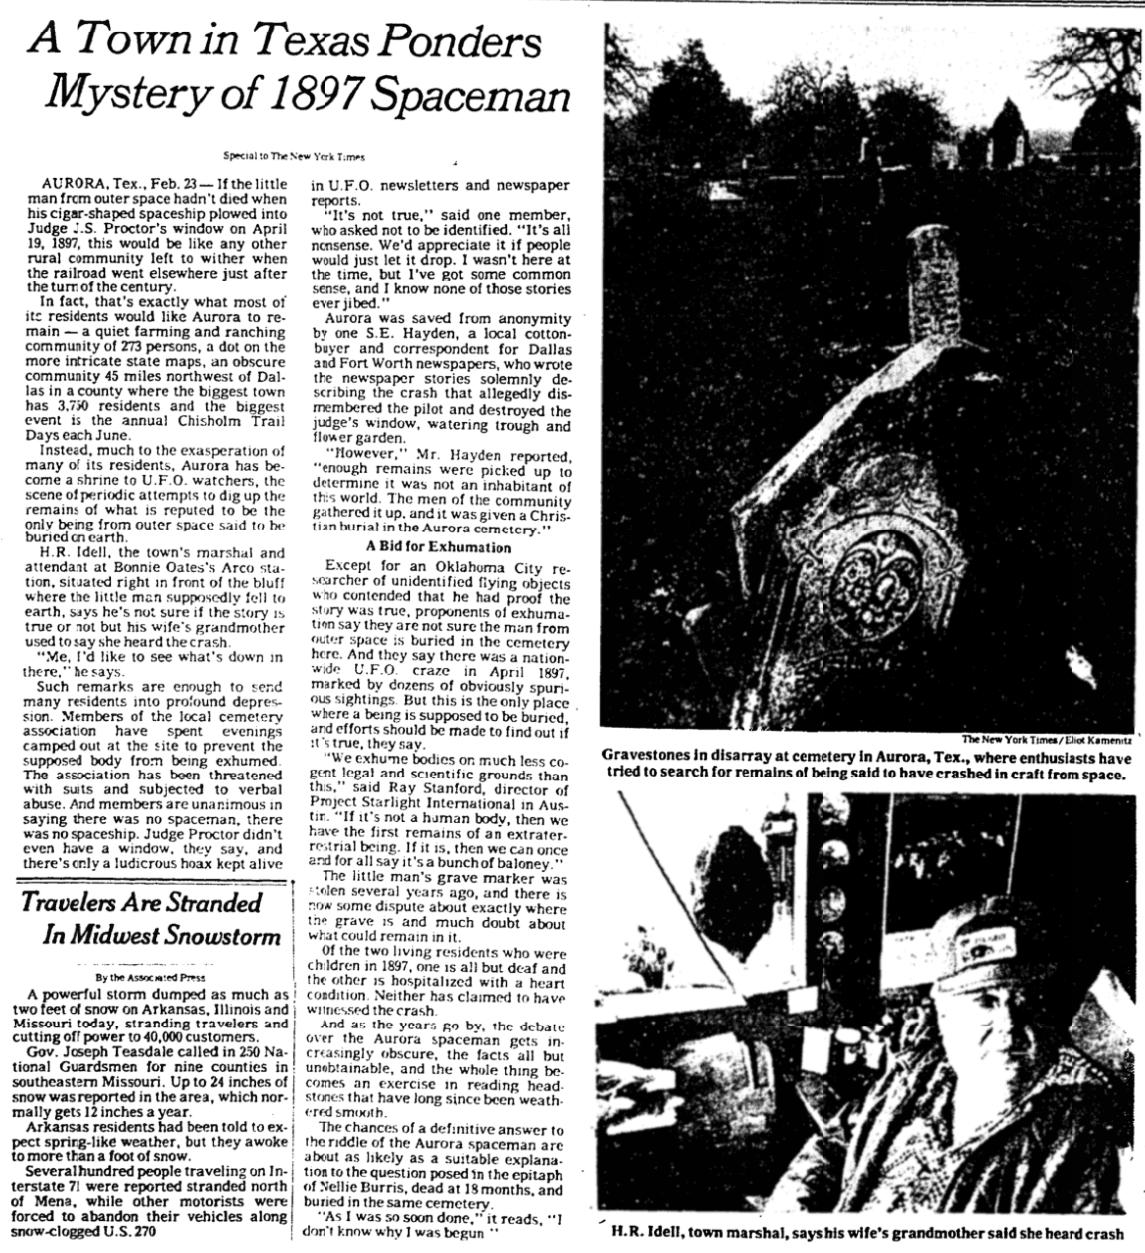 Mr. Applebome's 1979 article, as described above.